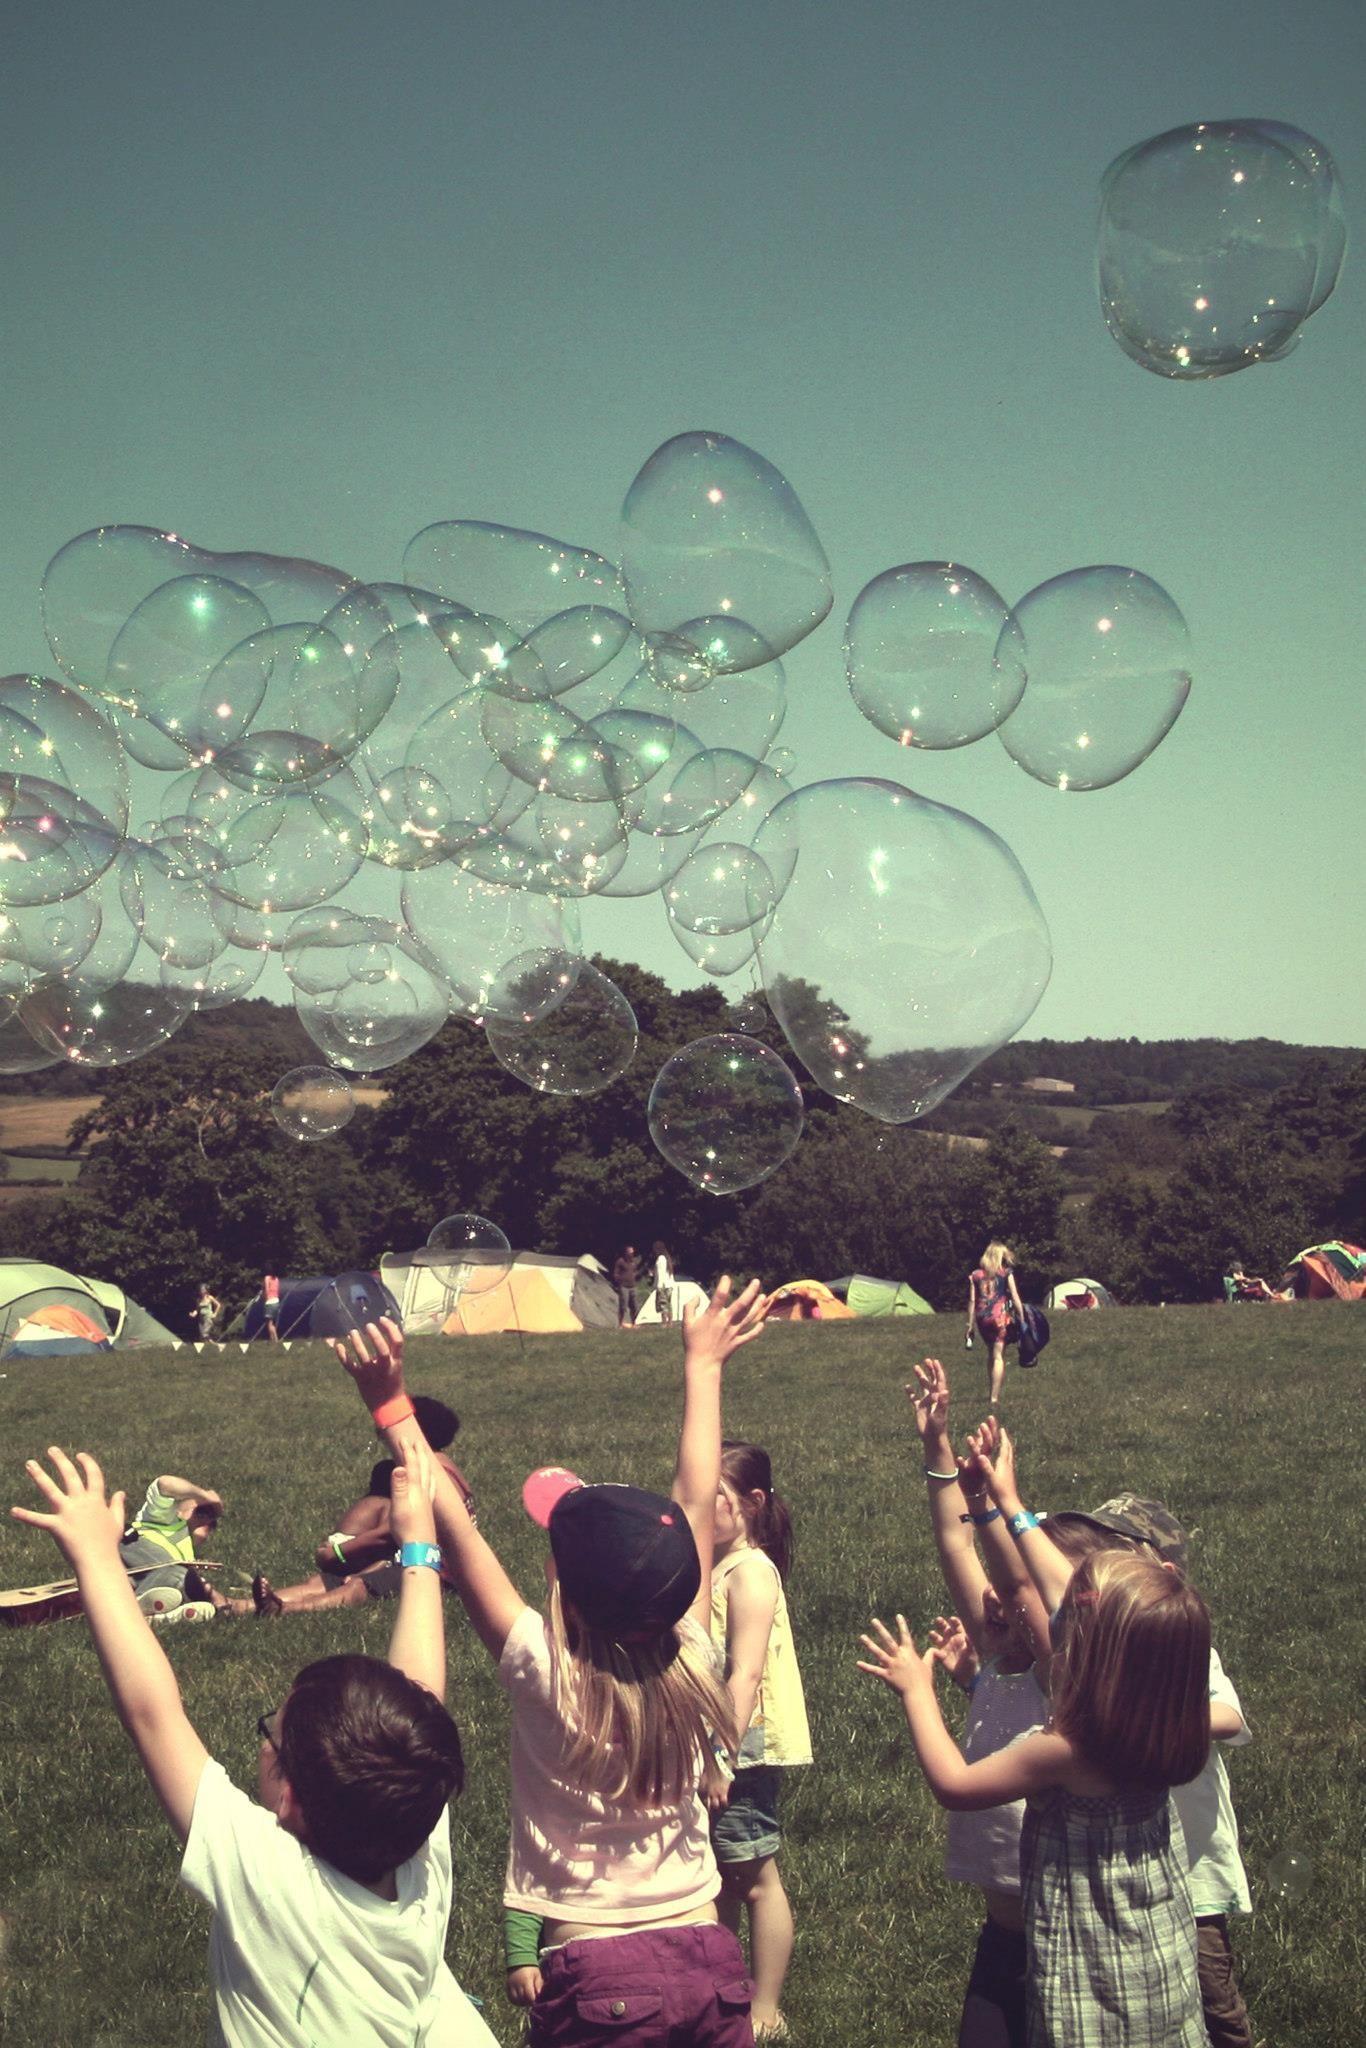 Dr Zigs Extraordinary Bubbles at Ymuno Festival 2014 - visit our website www.drzigs.com